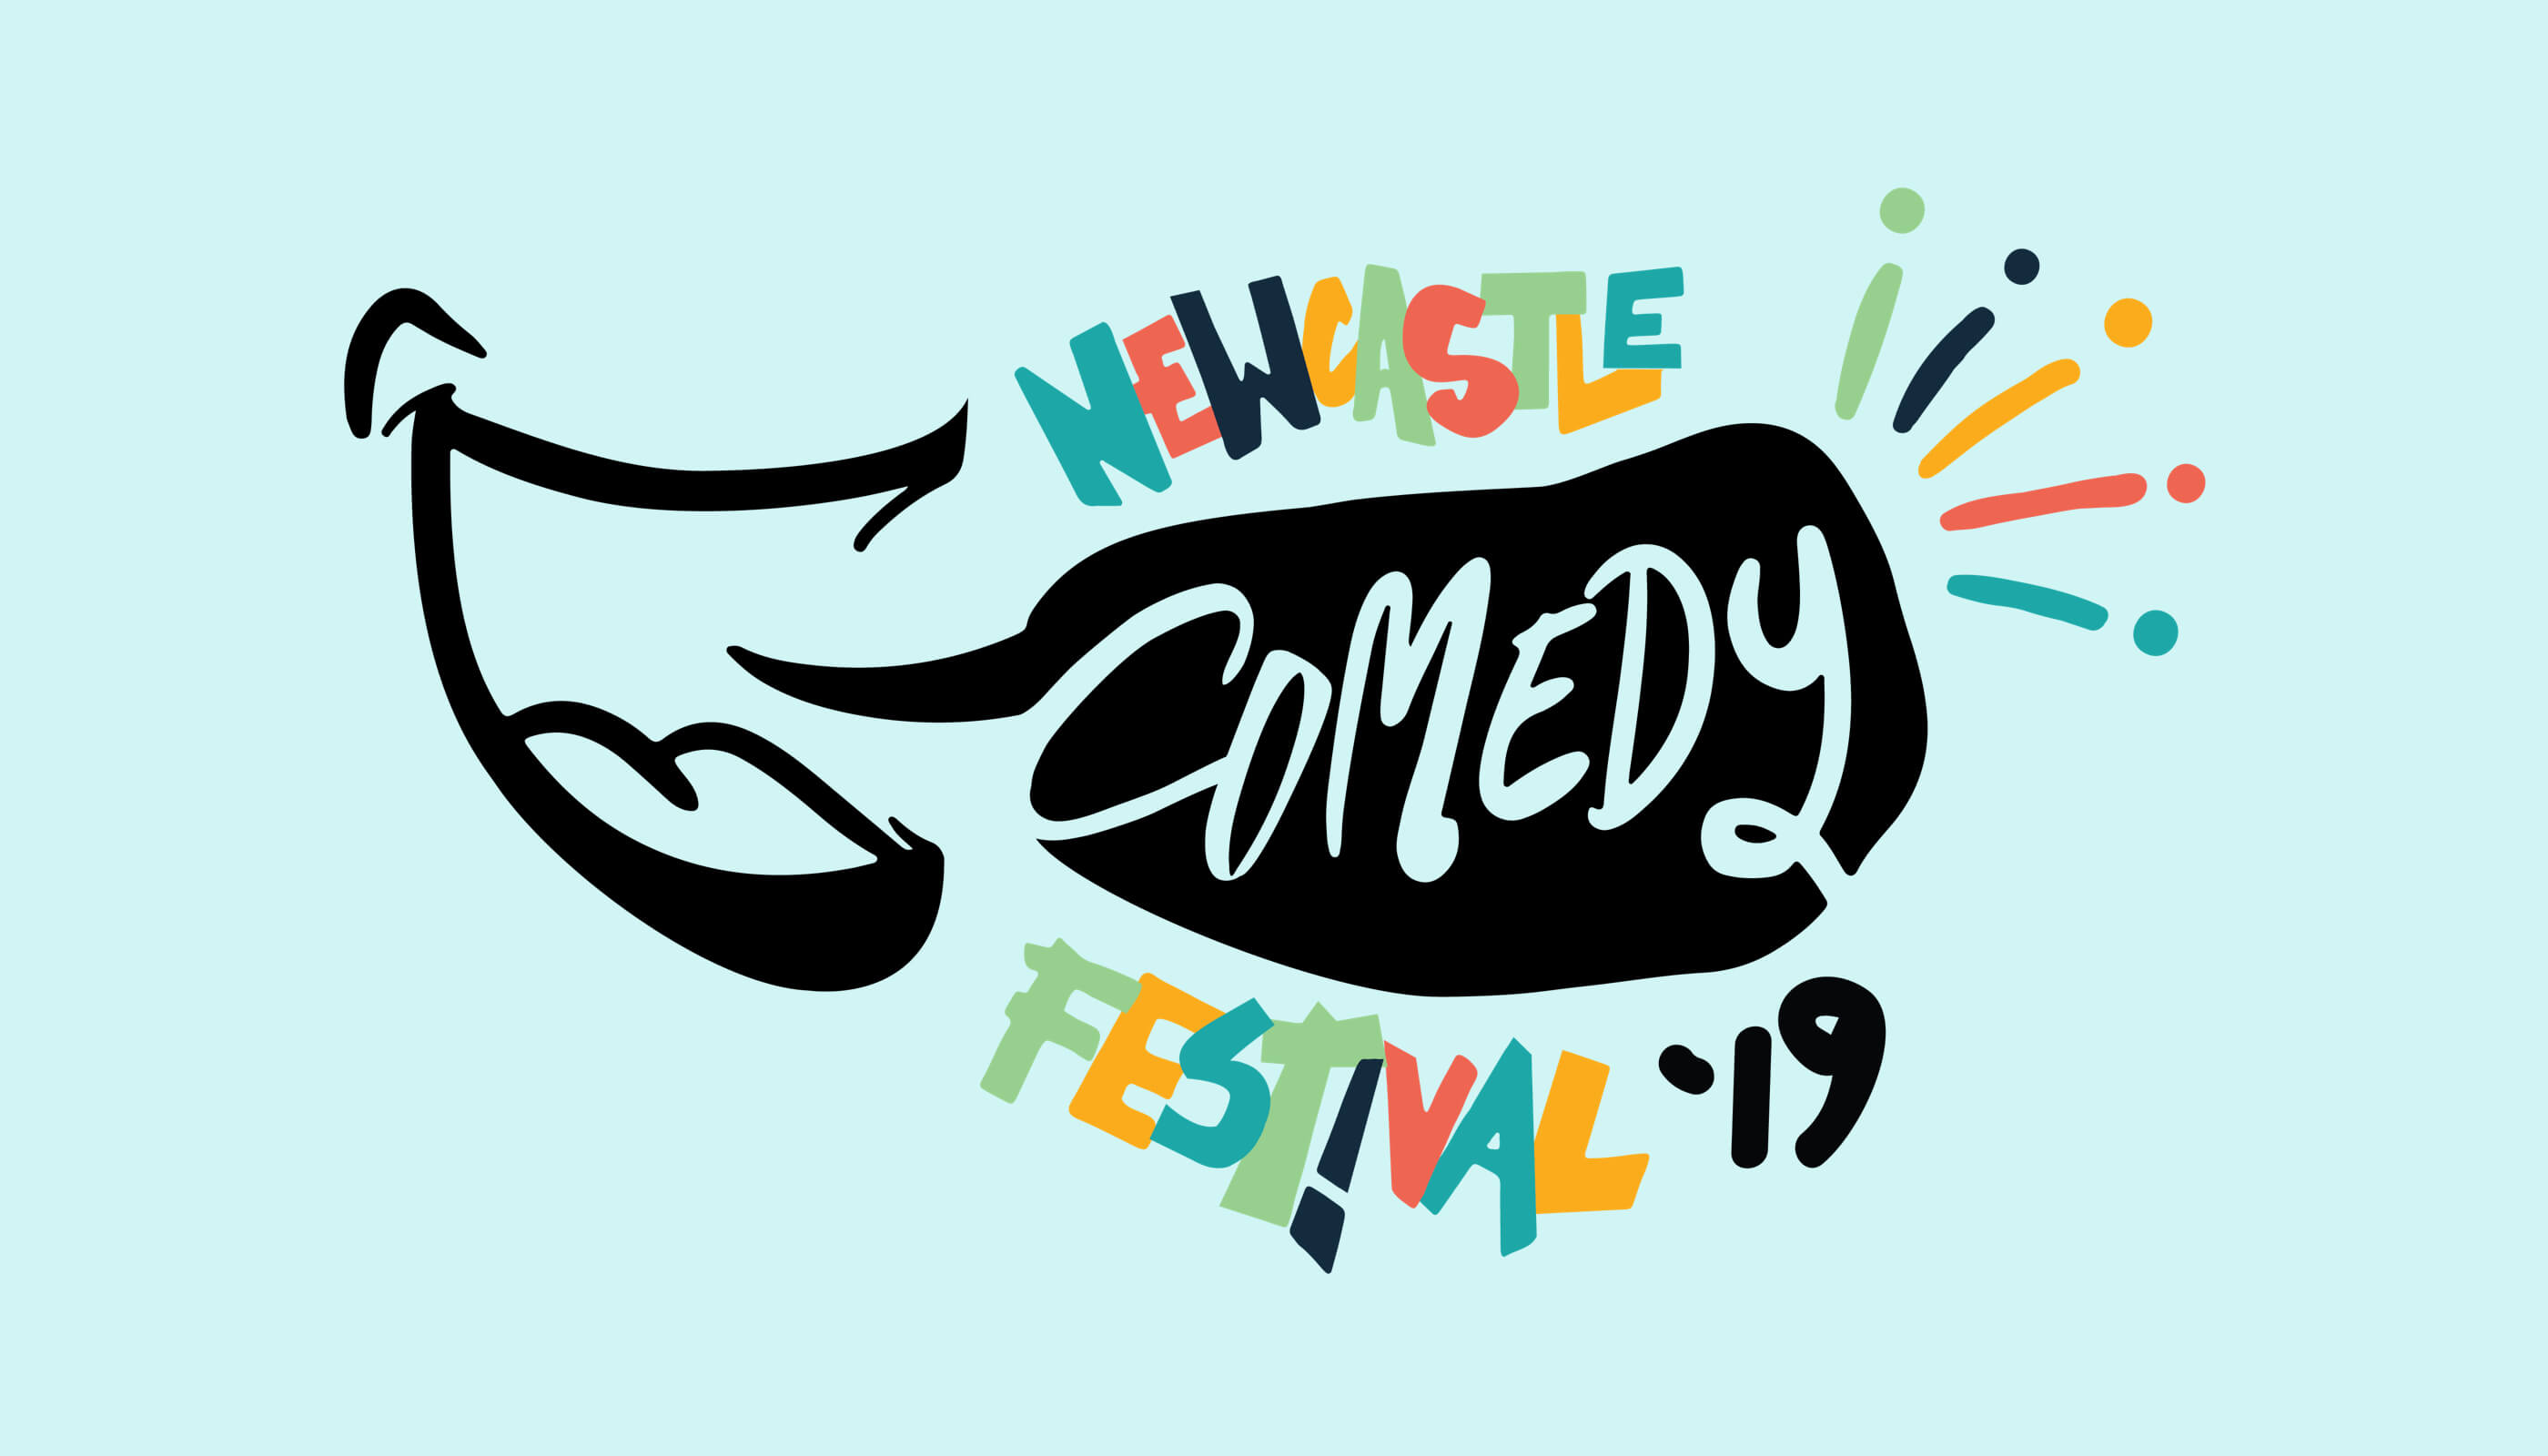 newcastle comedy festival 2019 banner logo